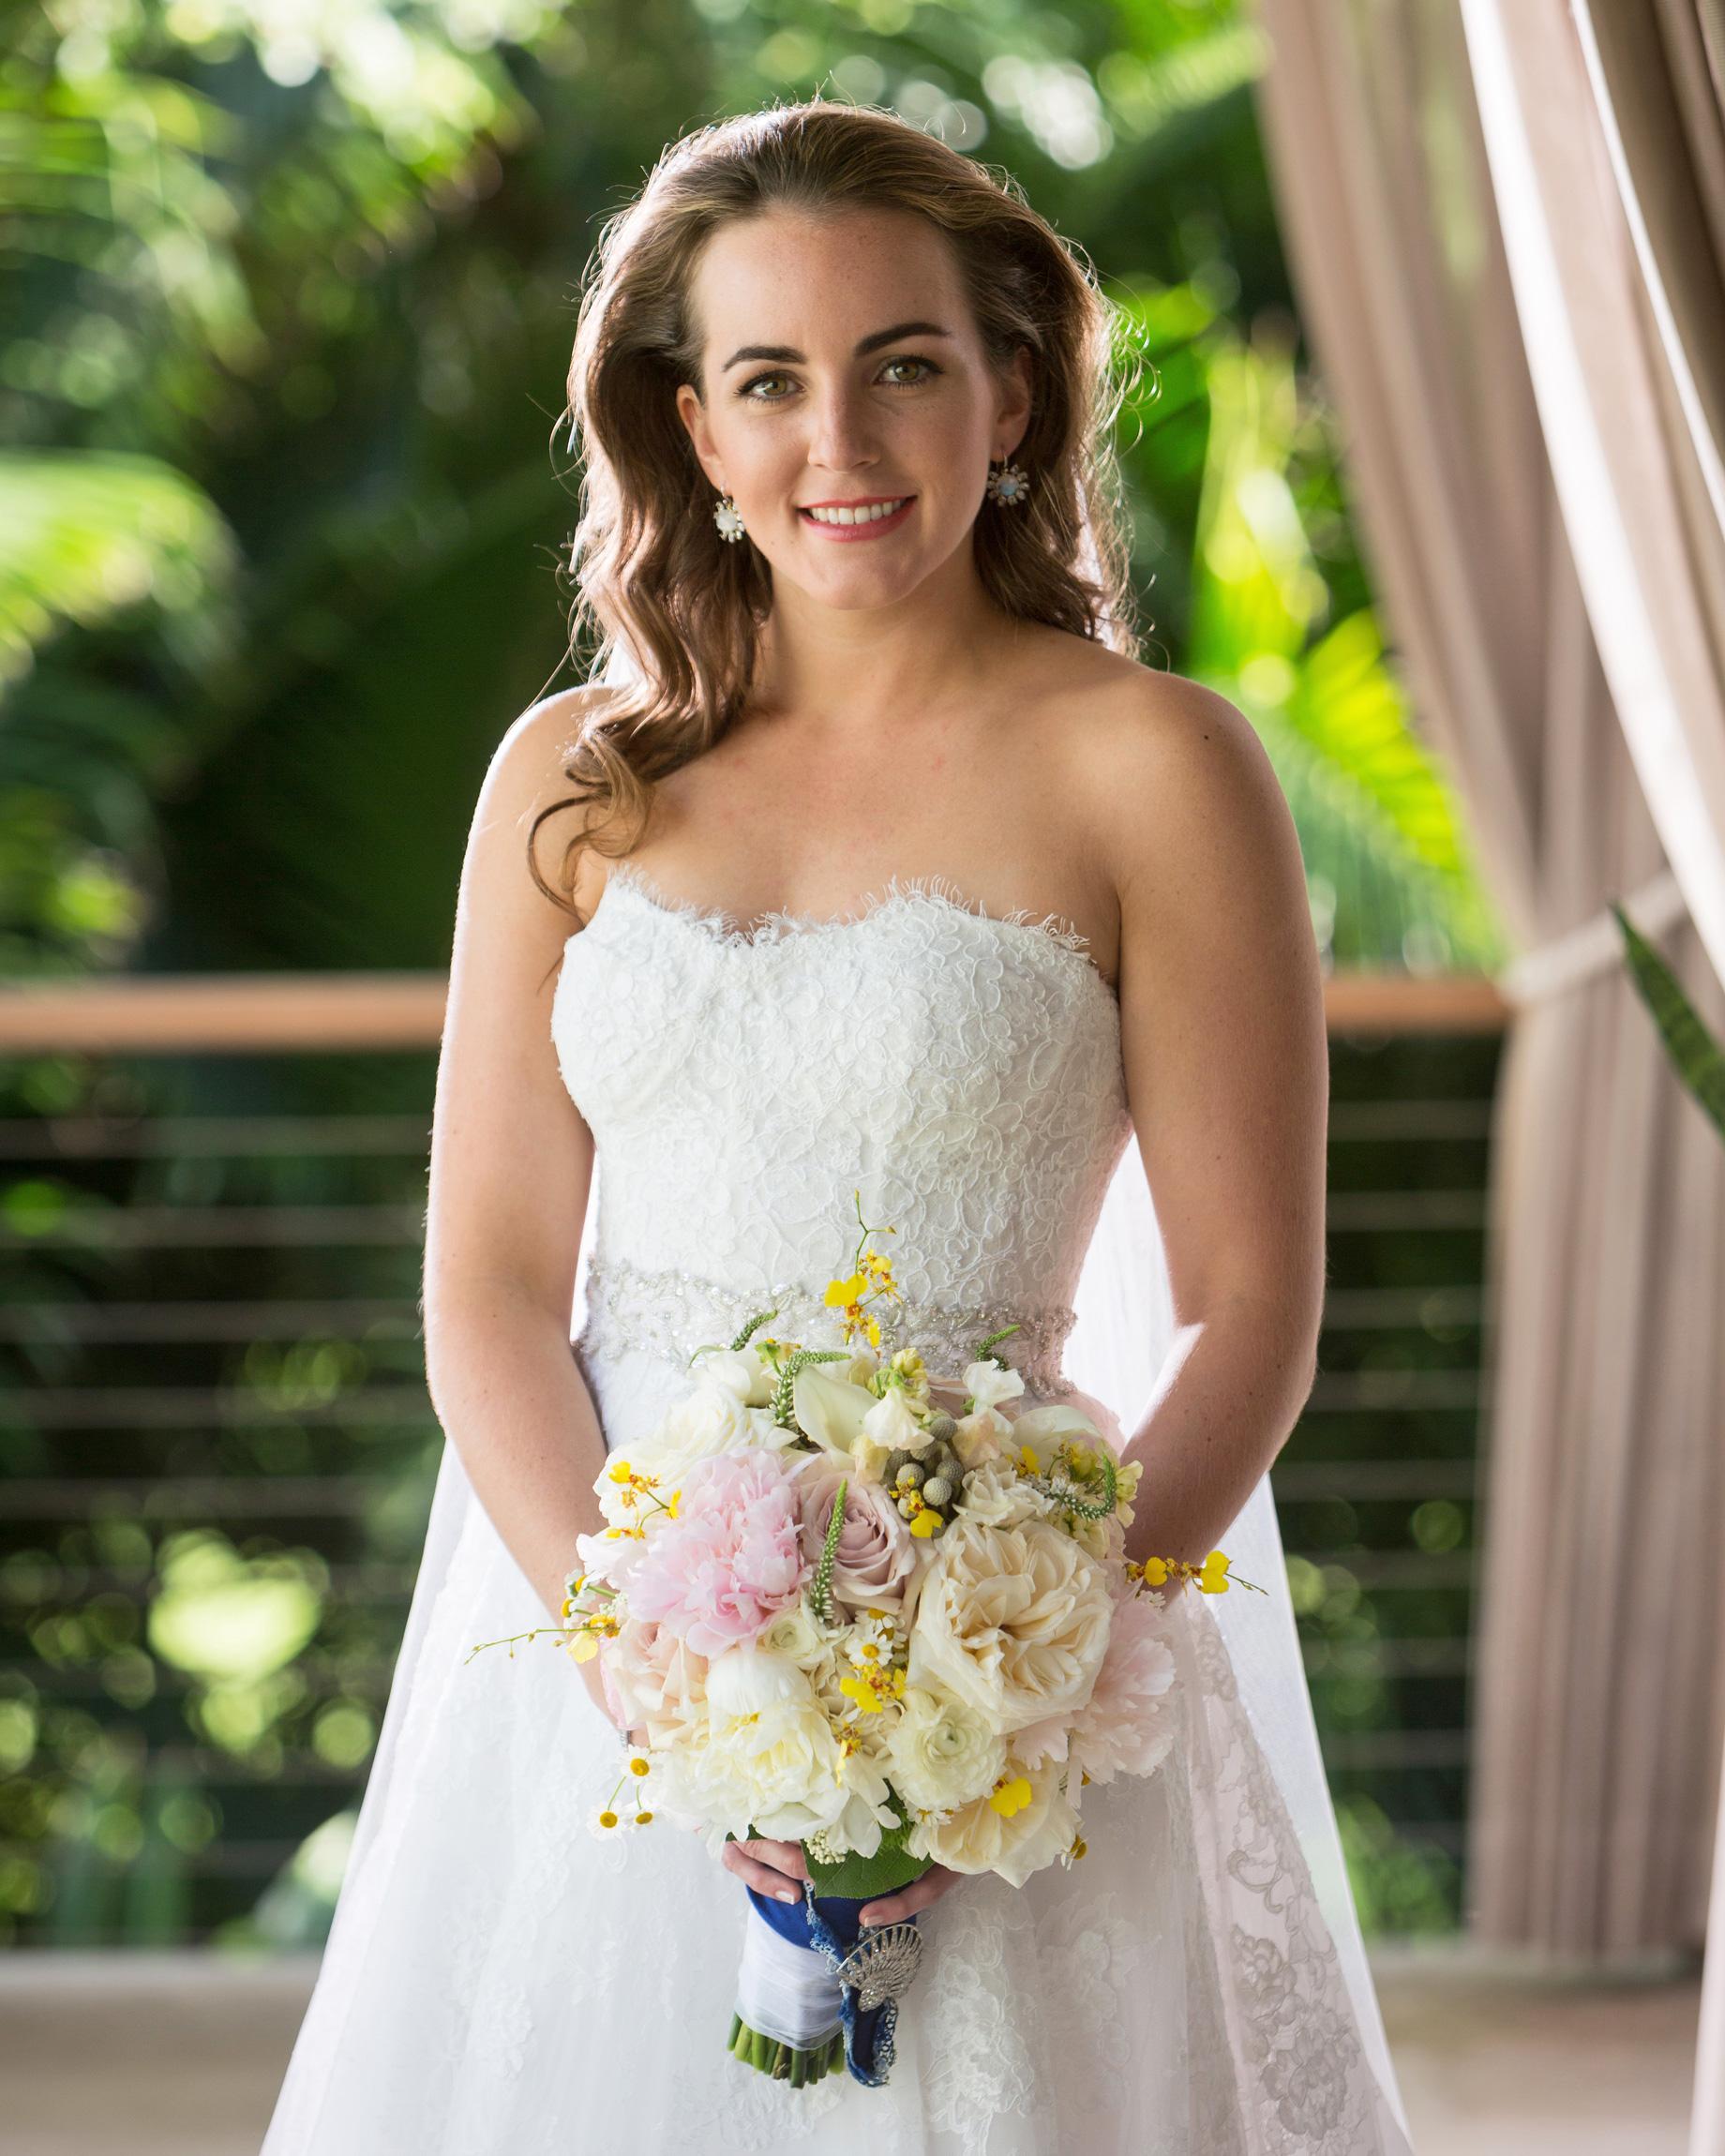 erin-ryan-florida-wedding-bride-bouquet-0641-s113010-0516.jpg